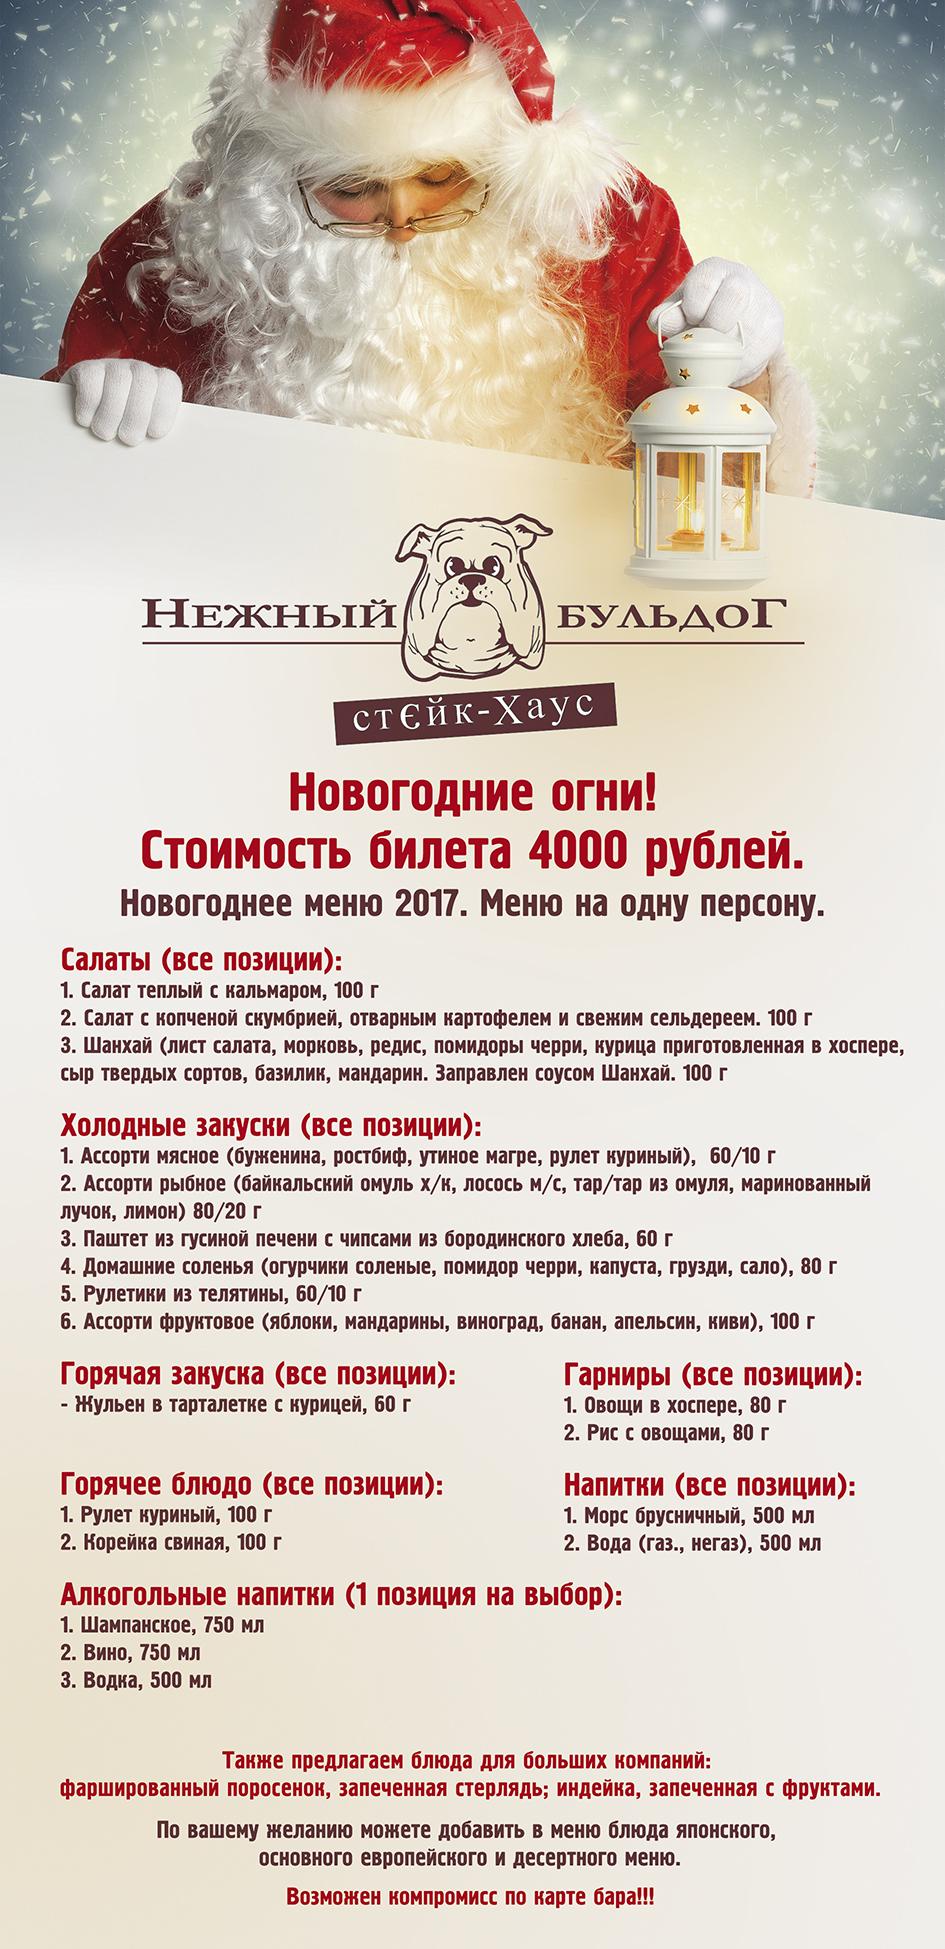 НБ_Нов. меню_4000 руб.jpg